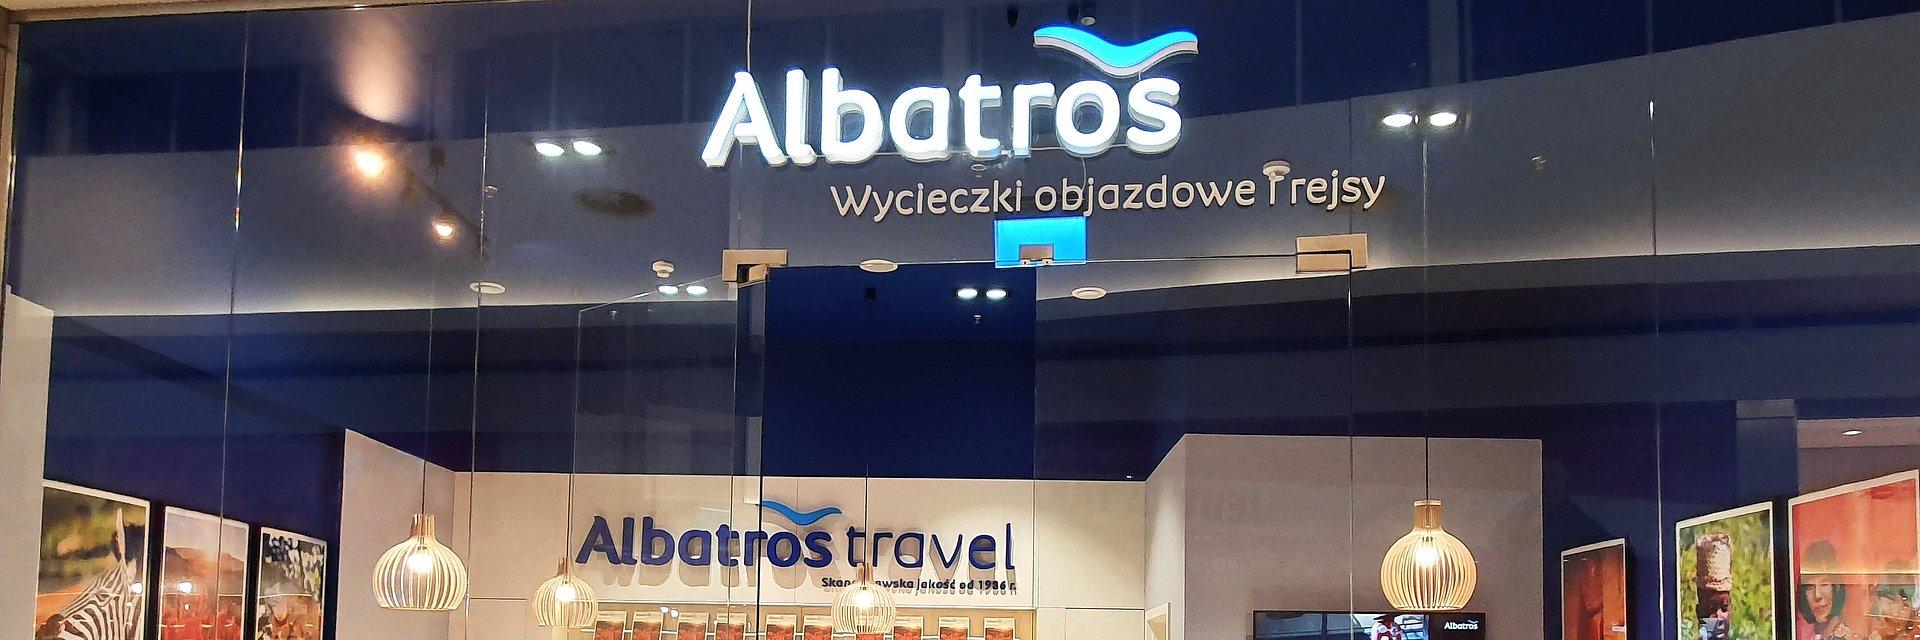 Silesia City Center z salonem Albatros